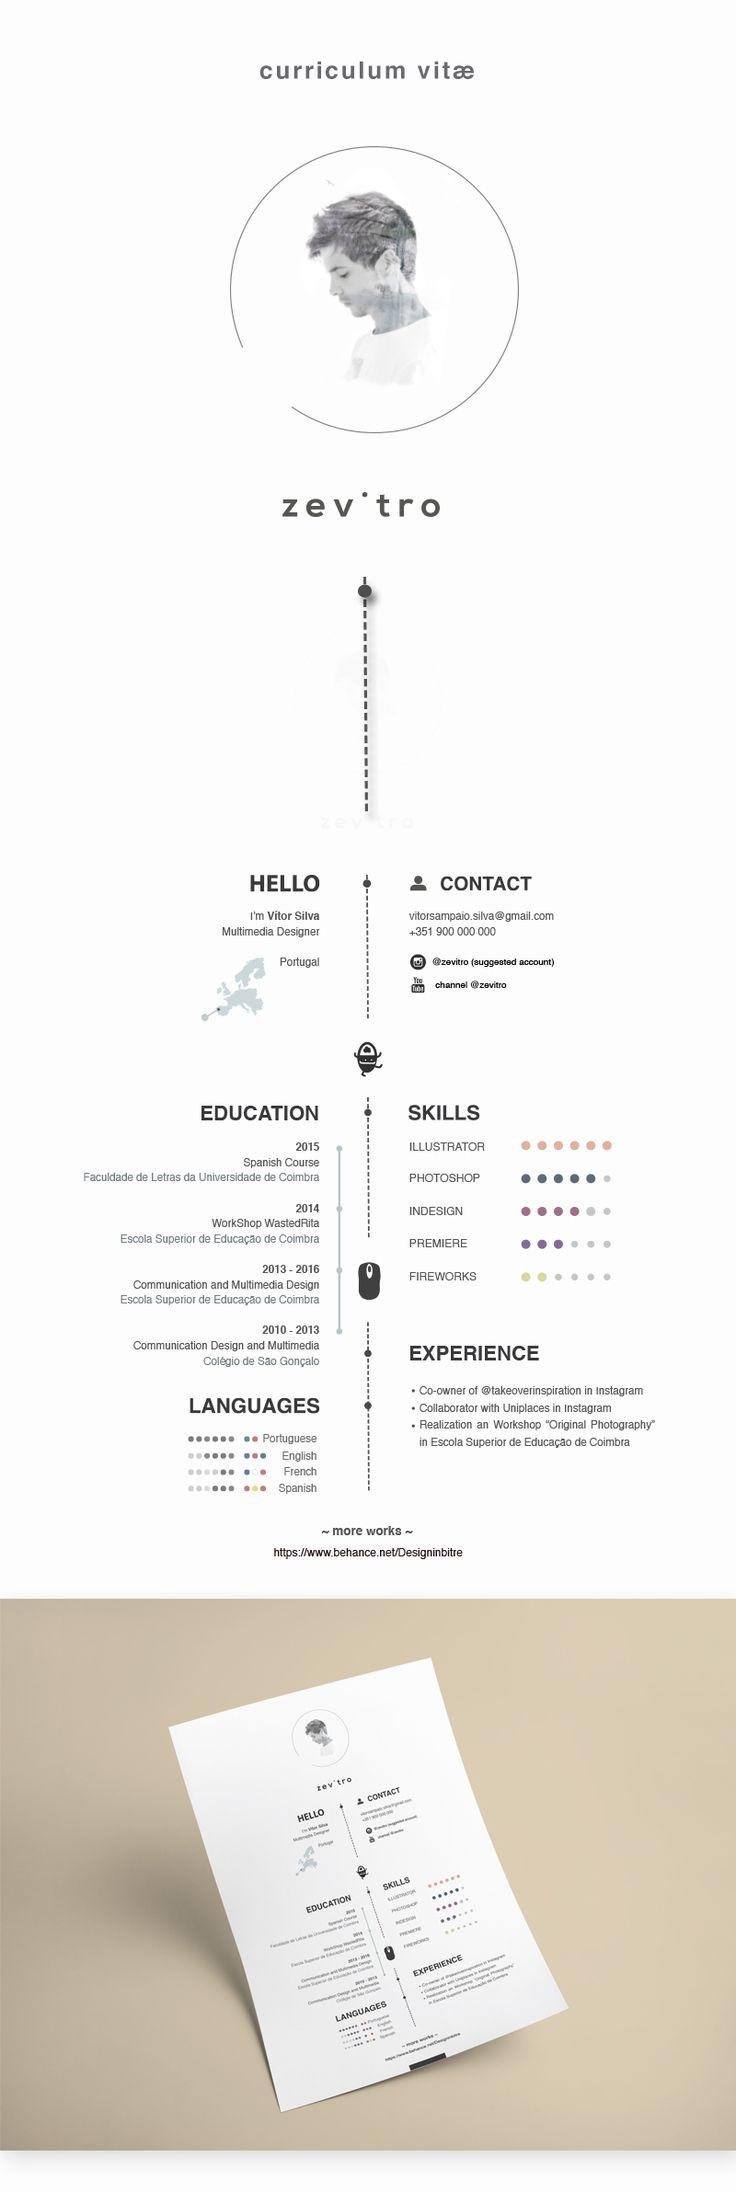 Curriculum vitæ - zevitro on Behance